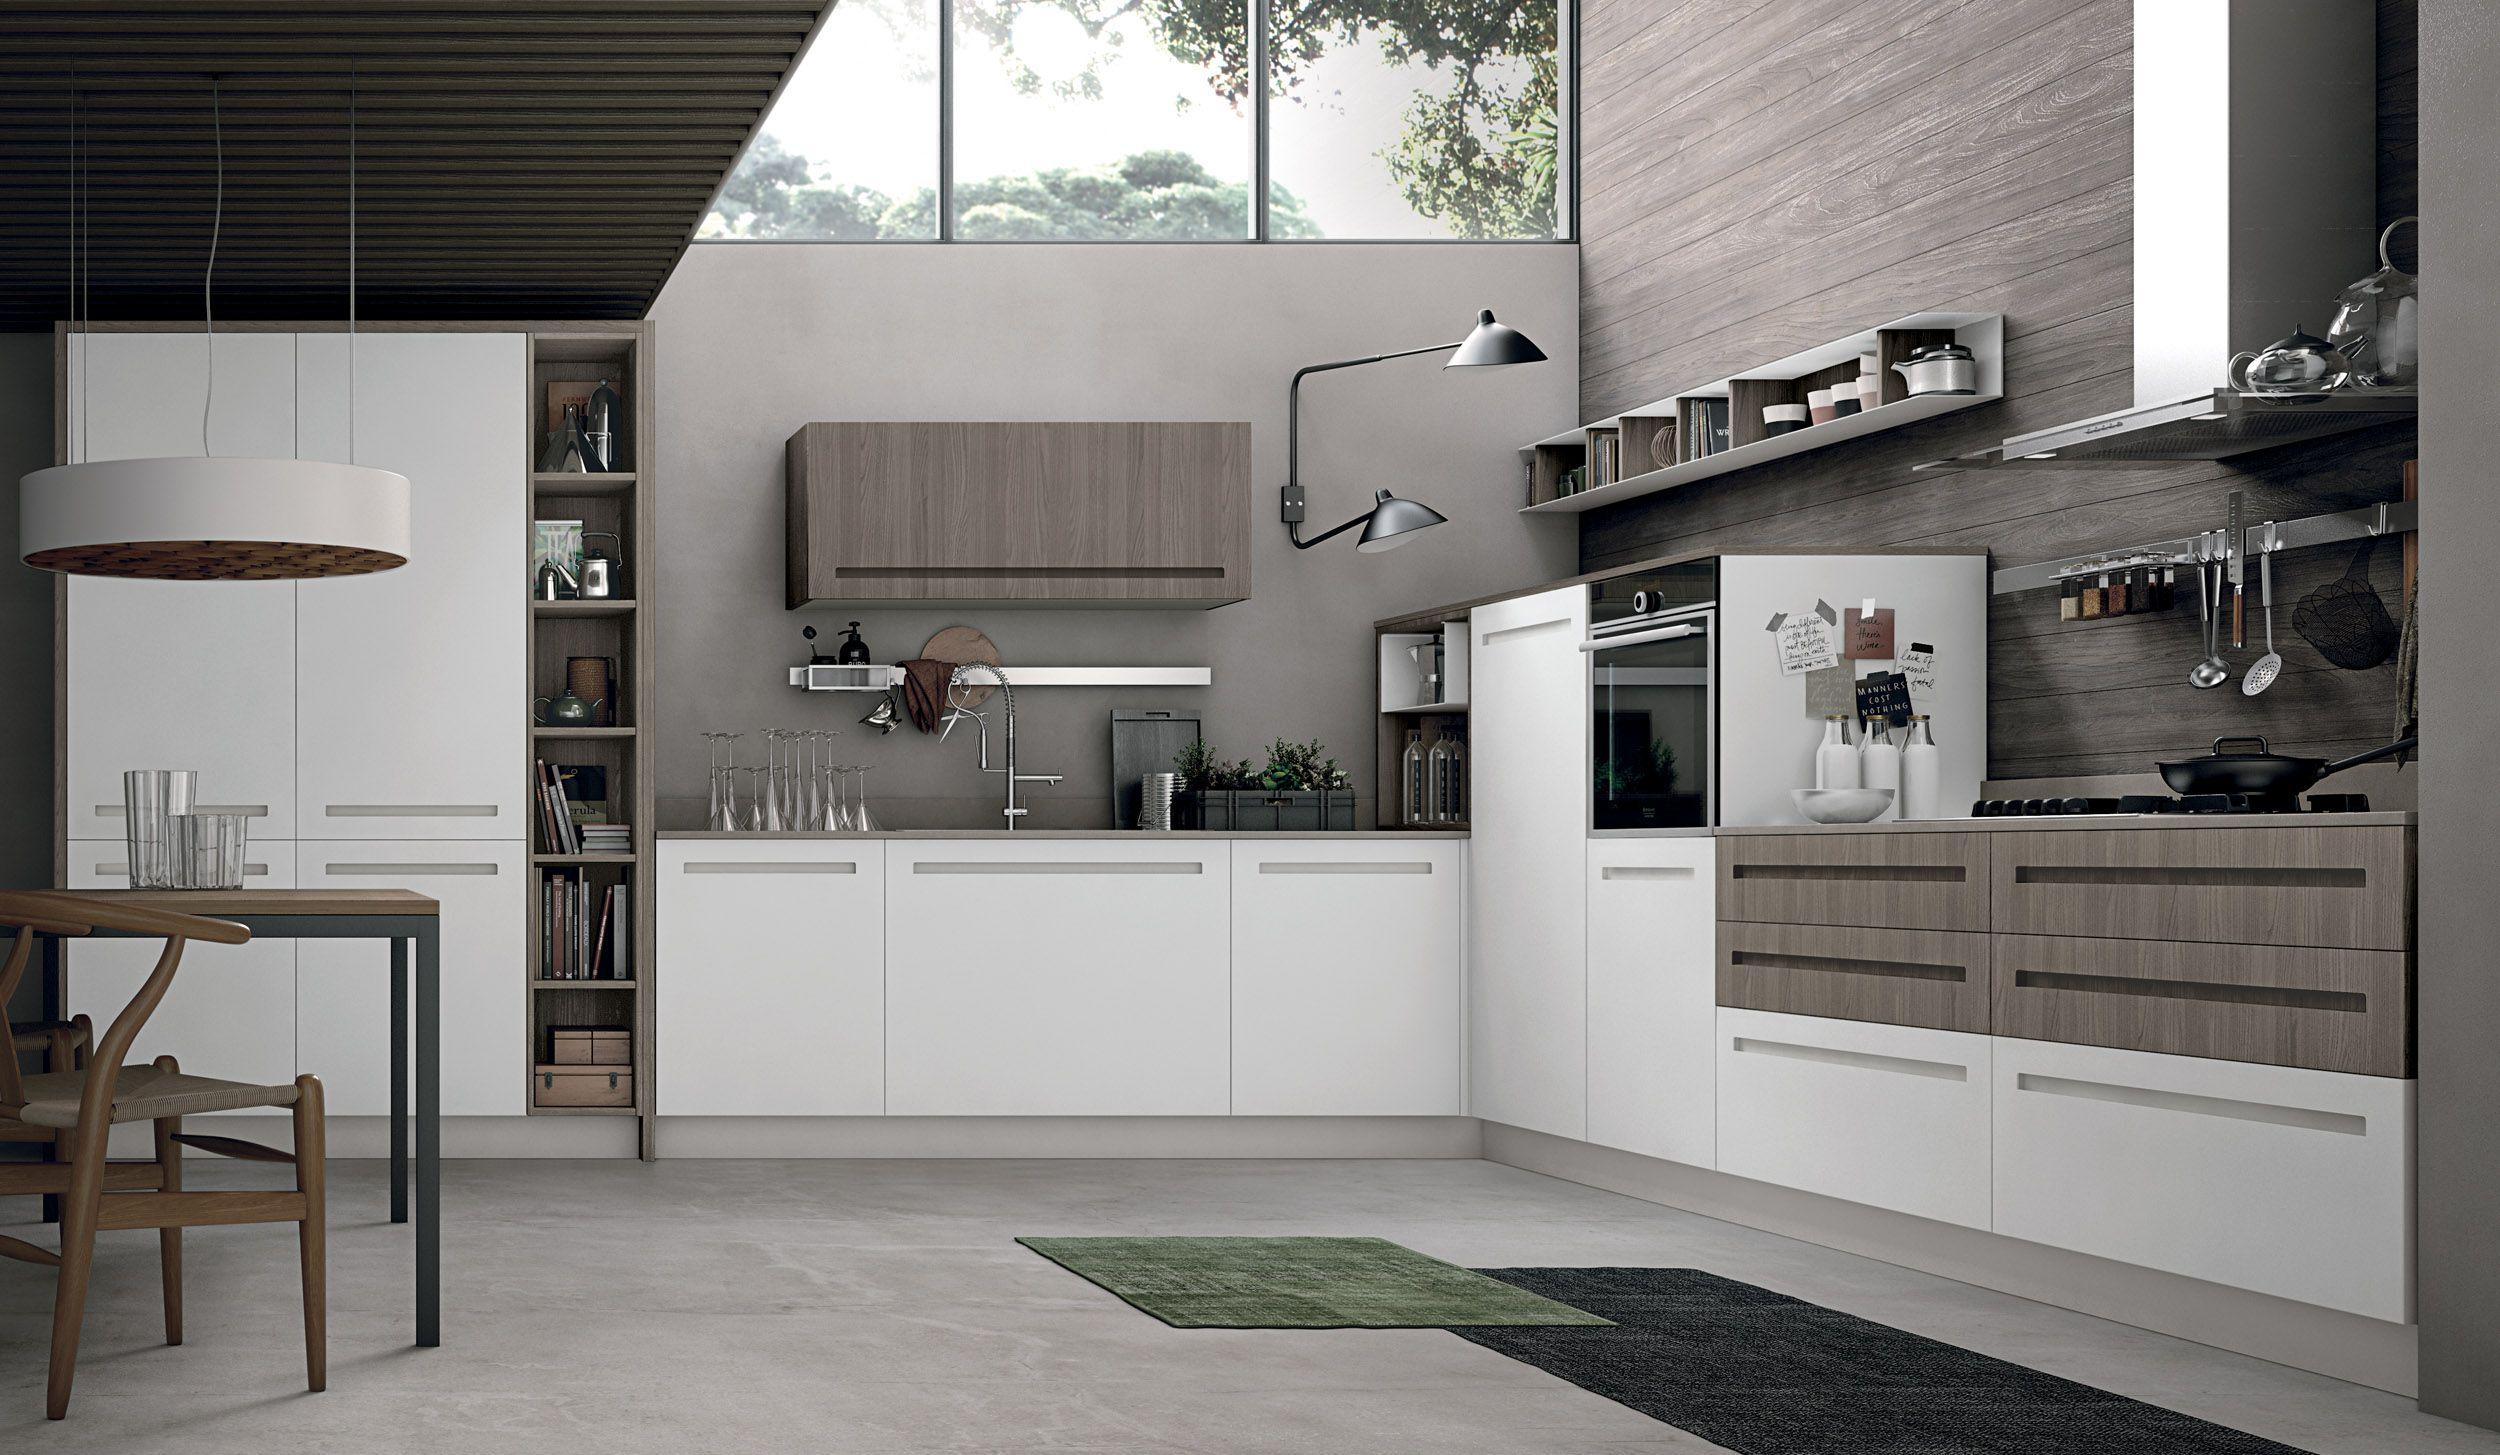 Stosa Cucine: arredamento per cucine moderne Mood | Idee per ...